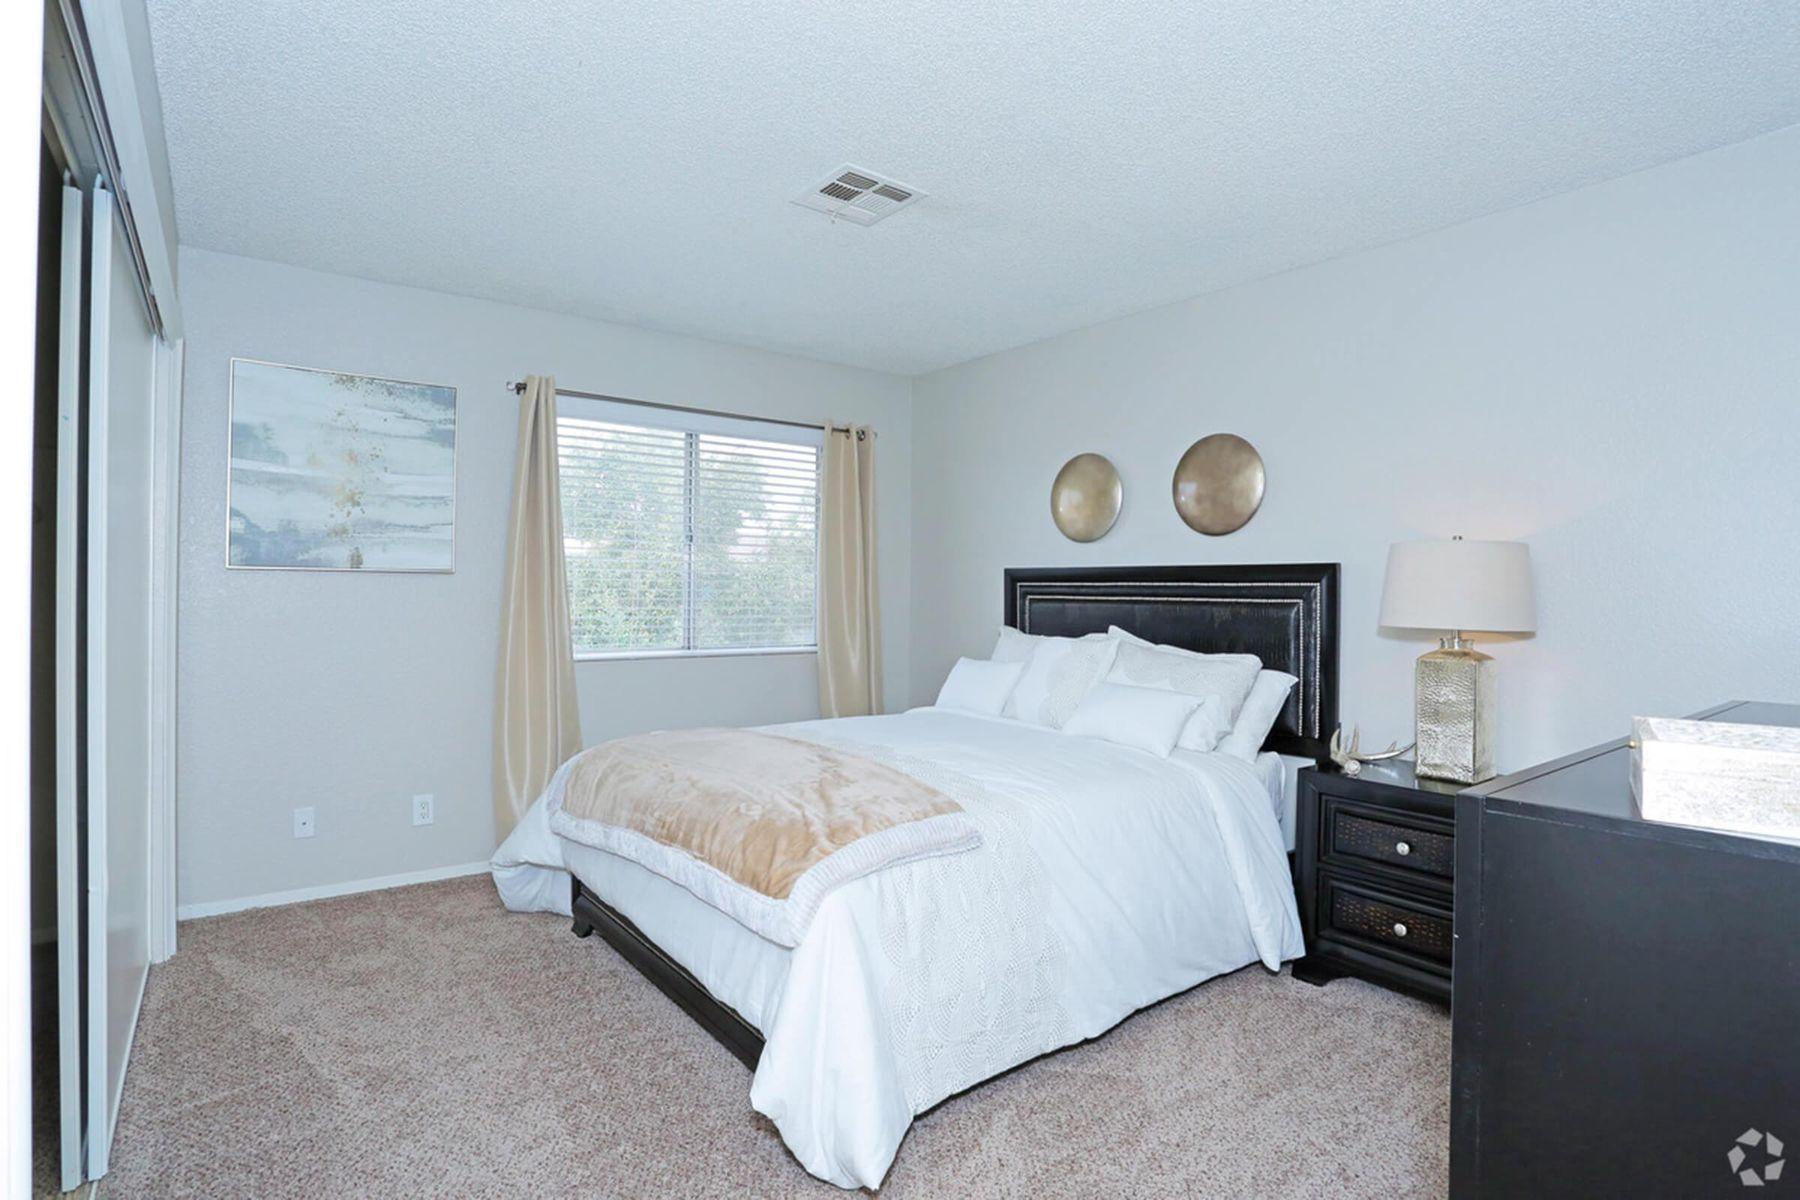 sunset-hills-apartments-henderson-nv-2br-2ba---960-sf-master-bedroom.jpg